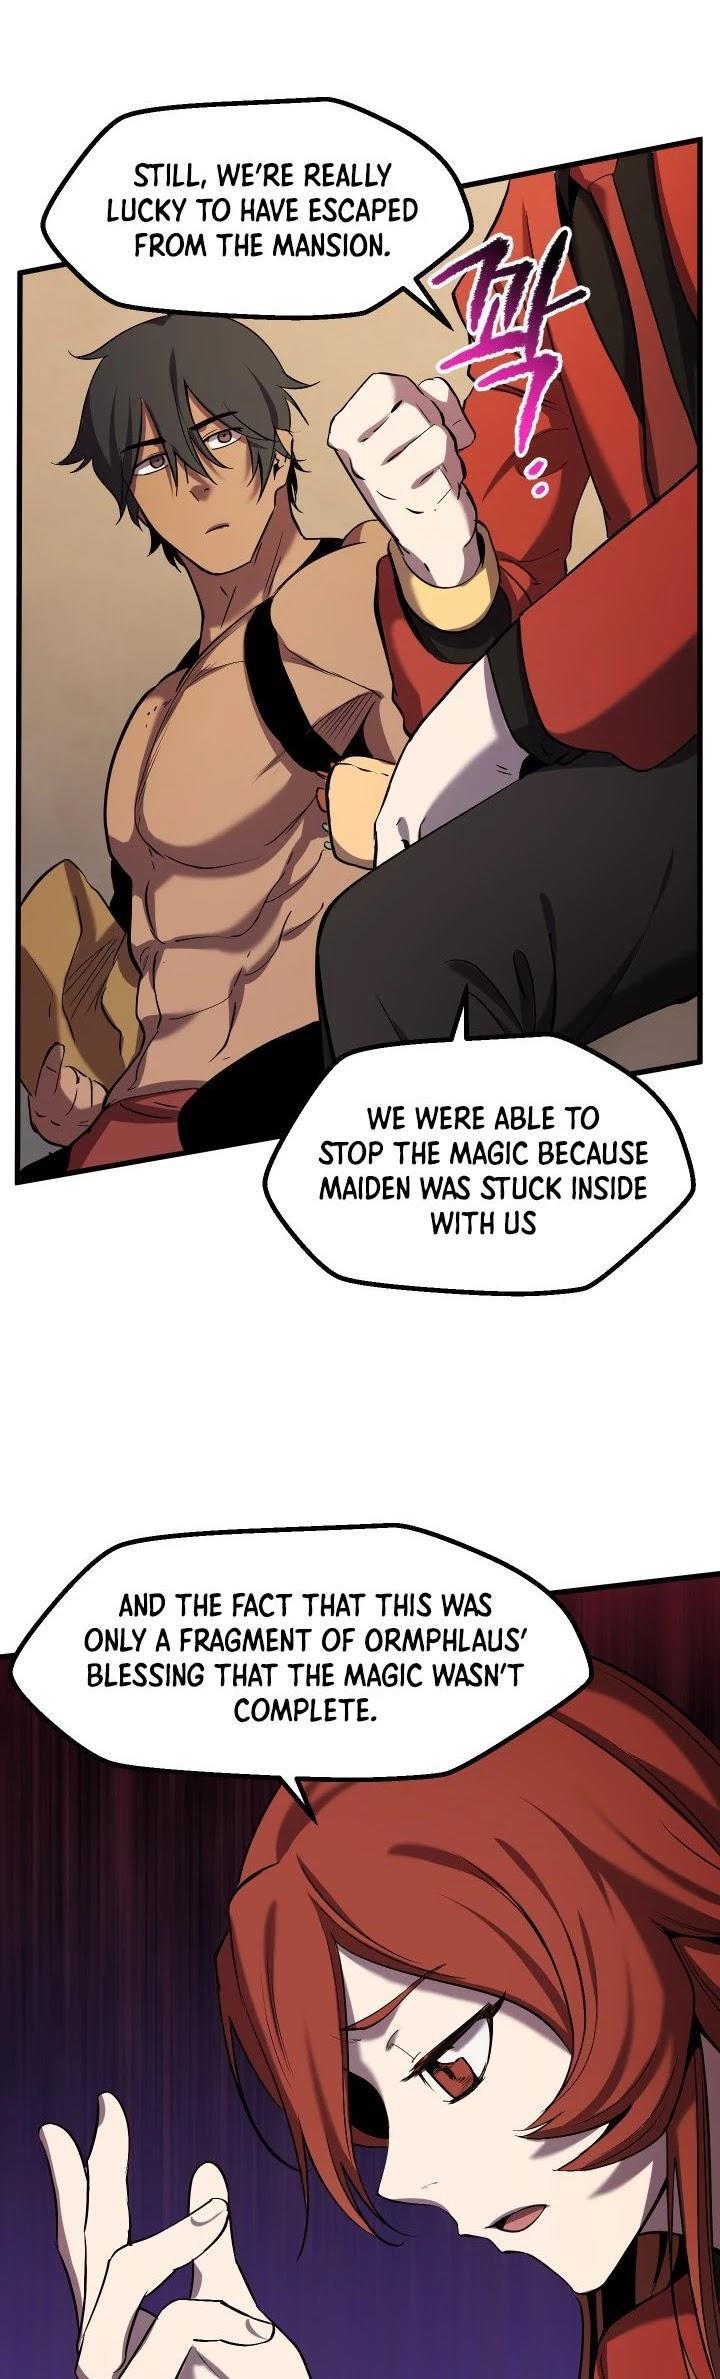 Survival Story Of A Sword King In A Fantasy World Chapter 50: End Season 1 page 27 - Mangakakalots.com